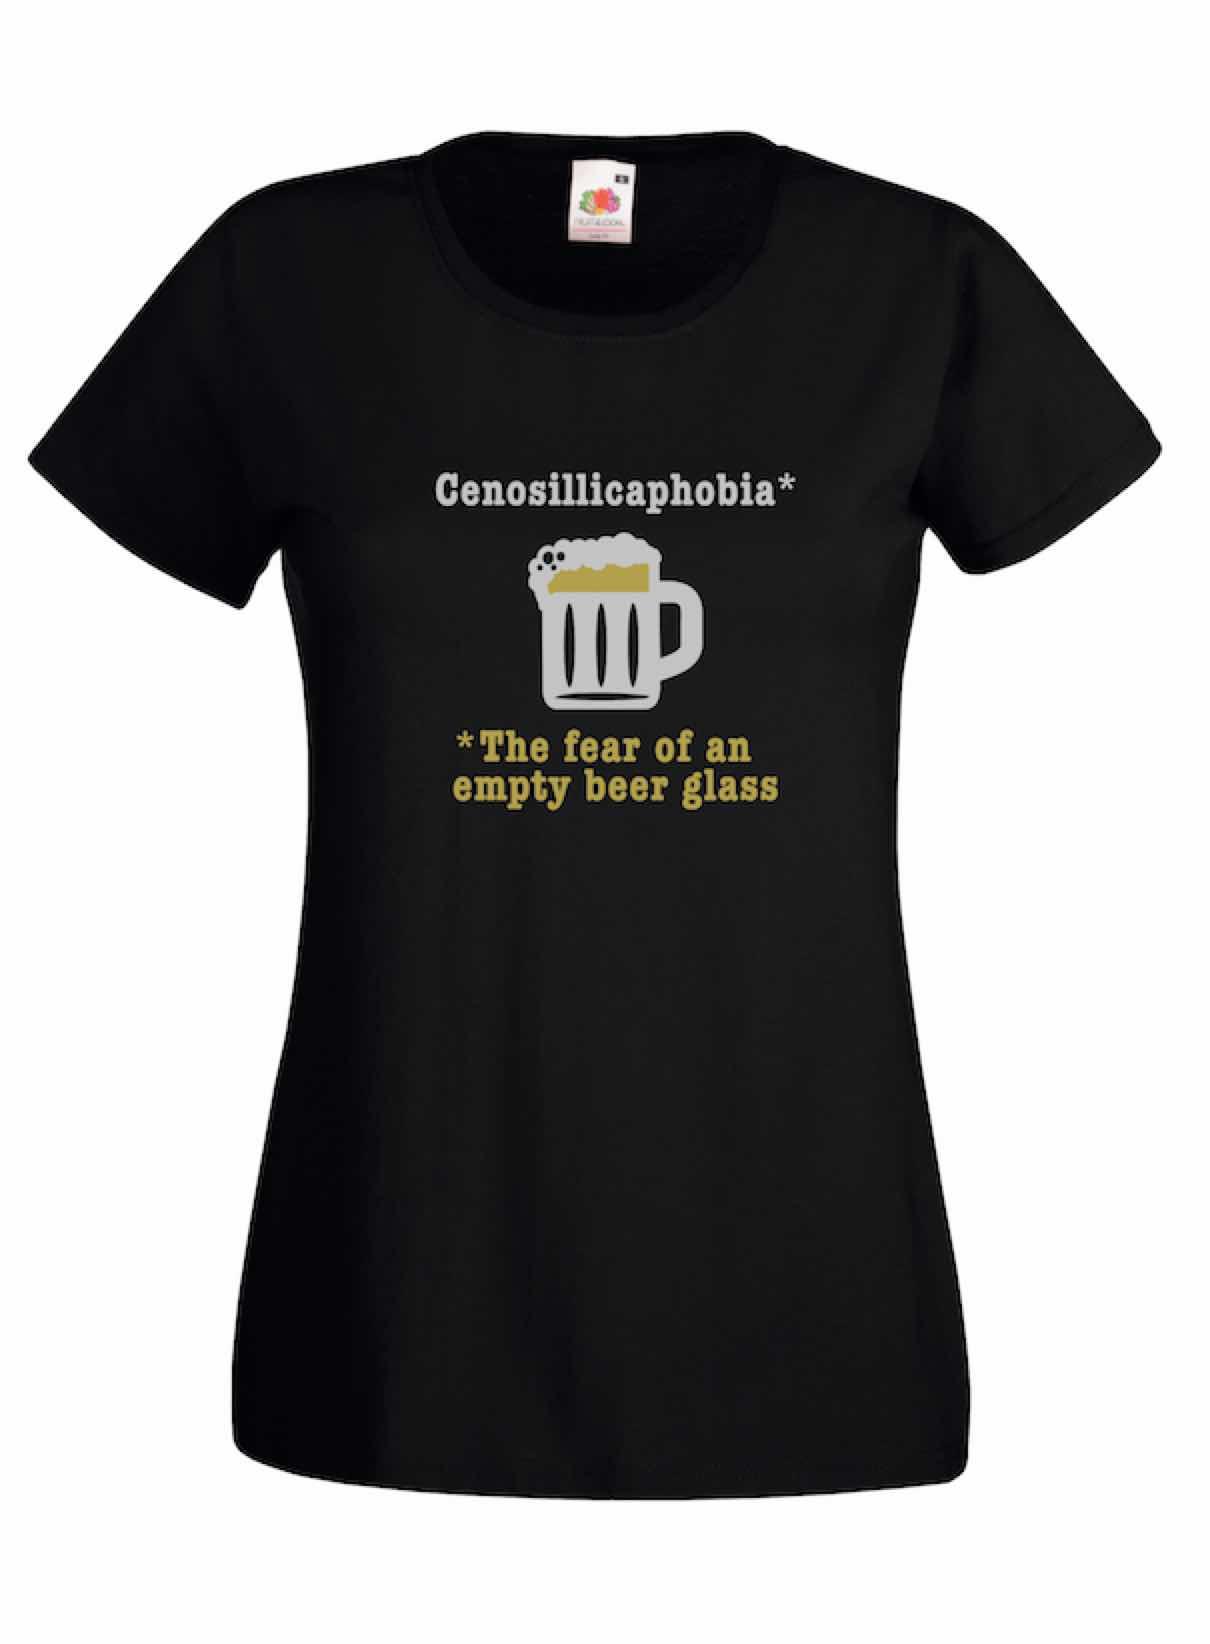 Cenosillicaphobia design for t-shirt, hoodie & sweatshirt